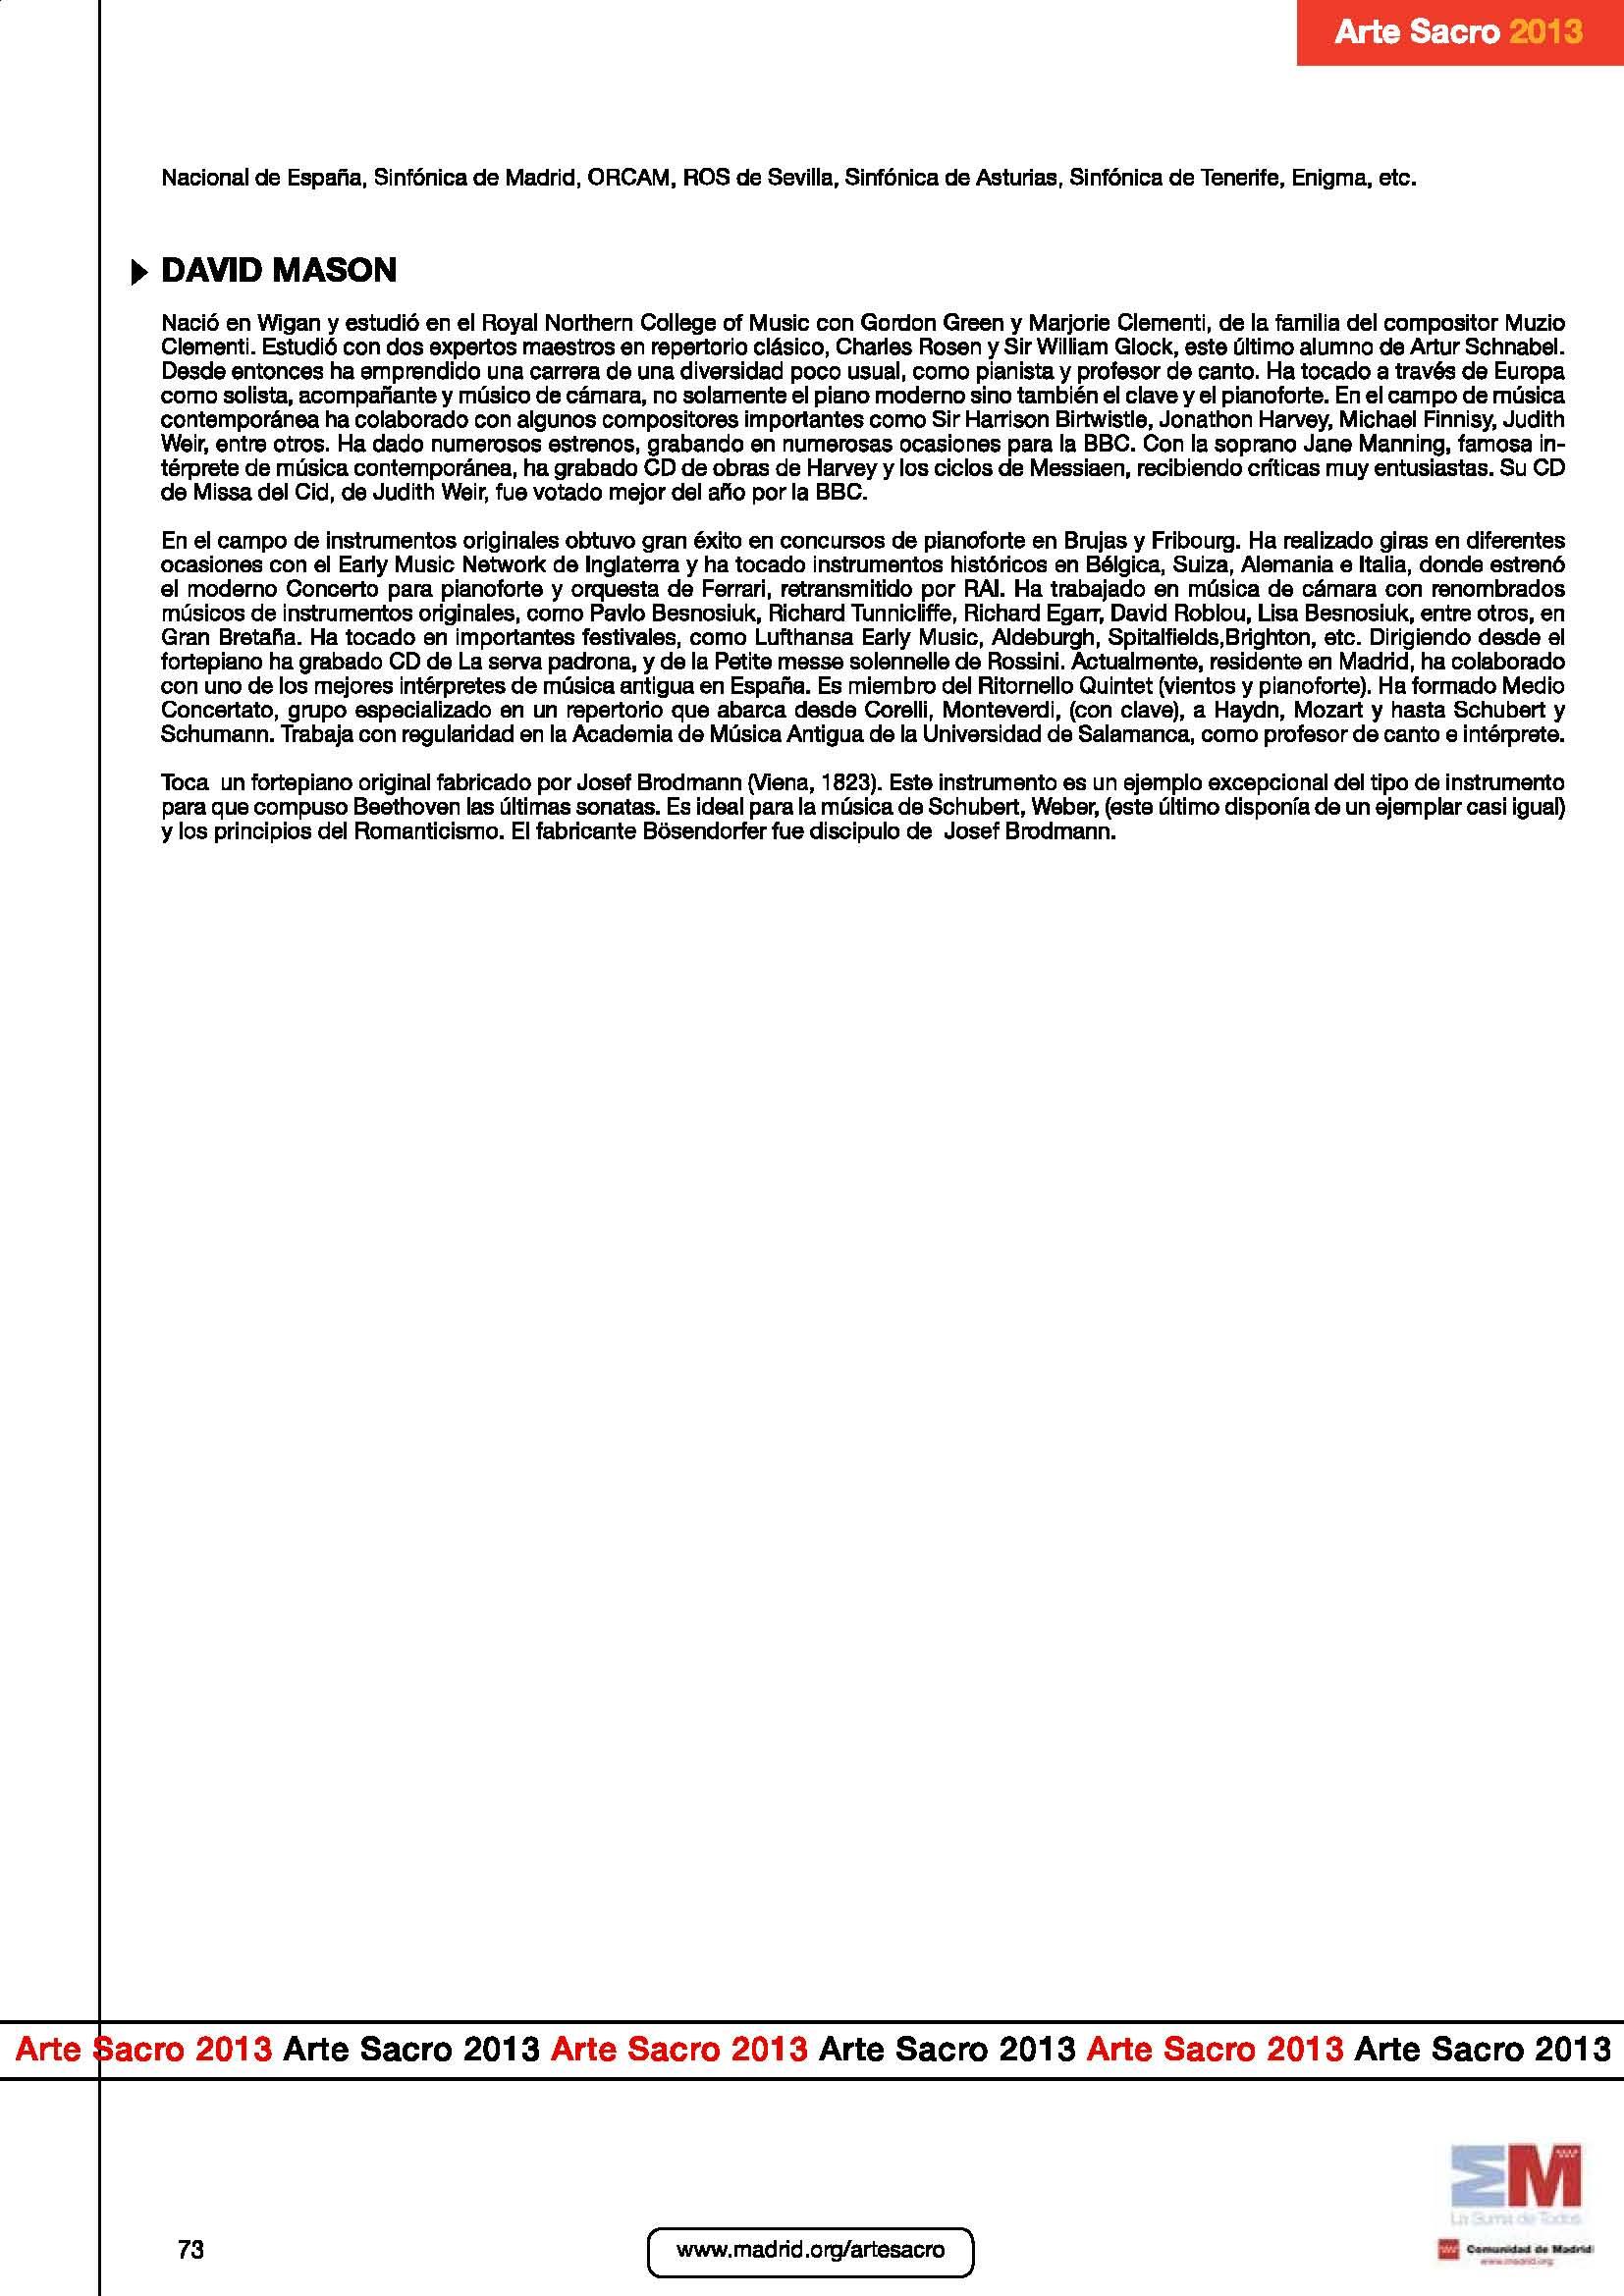 dossier_completo_Página_073